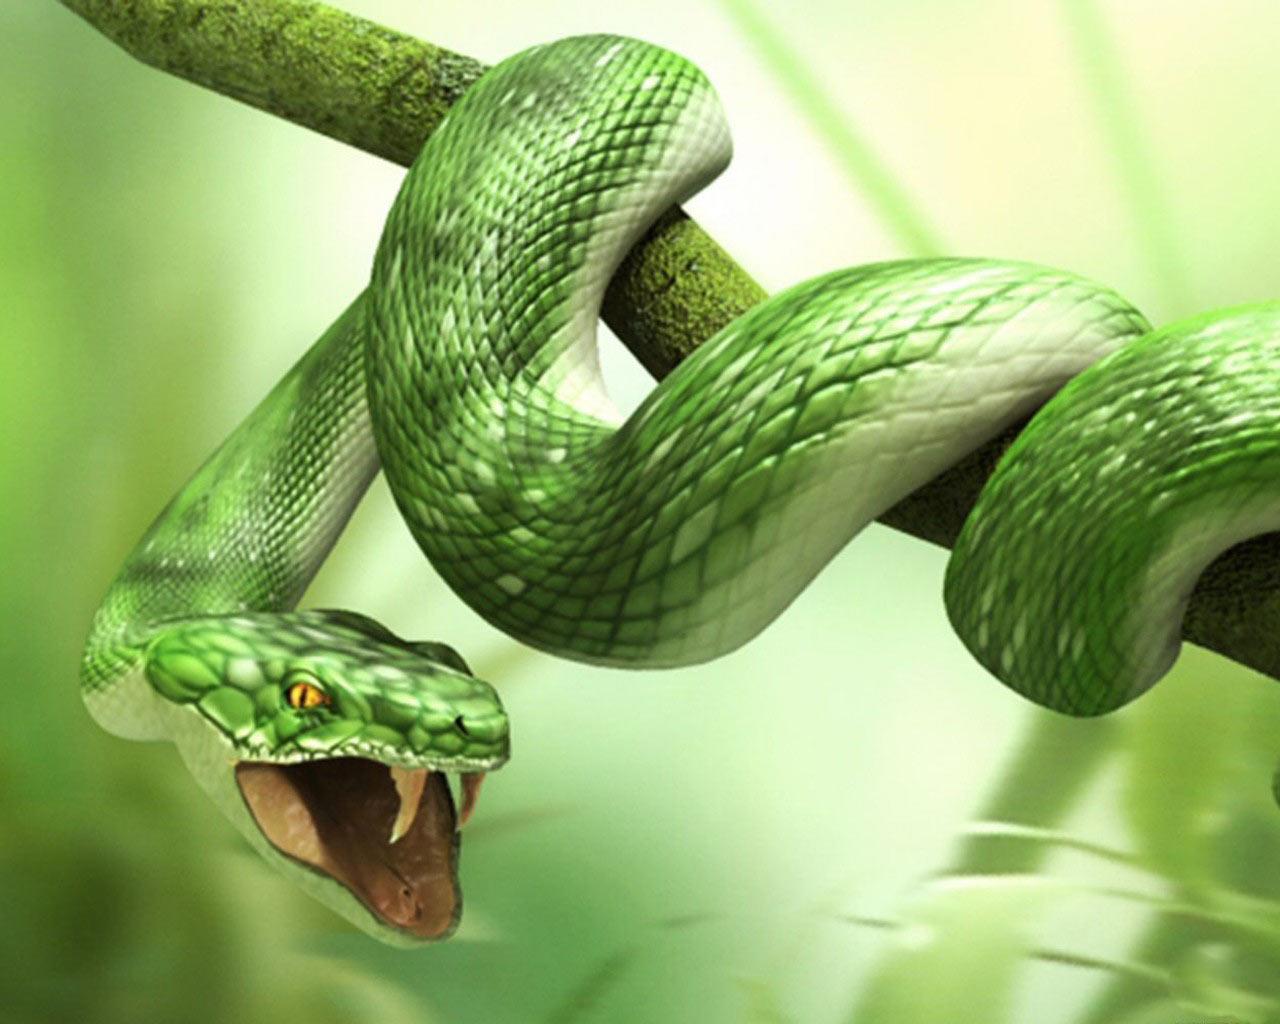 snake hd wallpapers best desktop background pictures widescreen